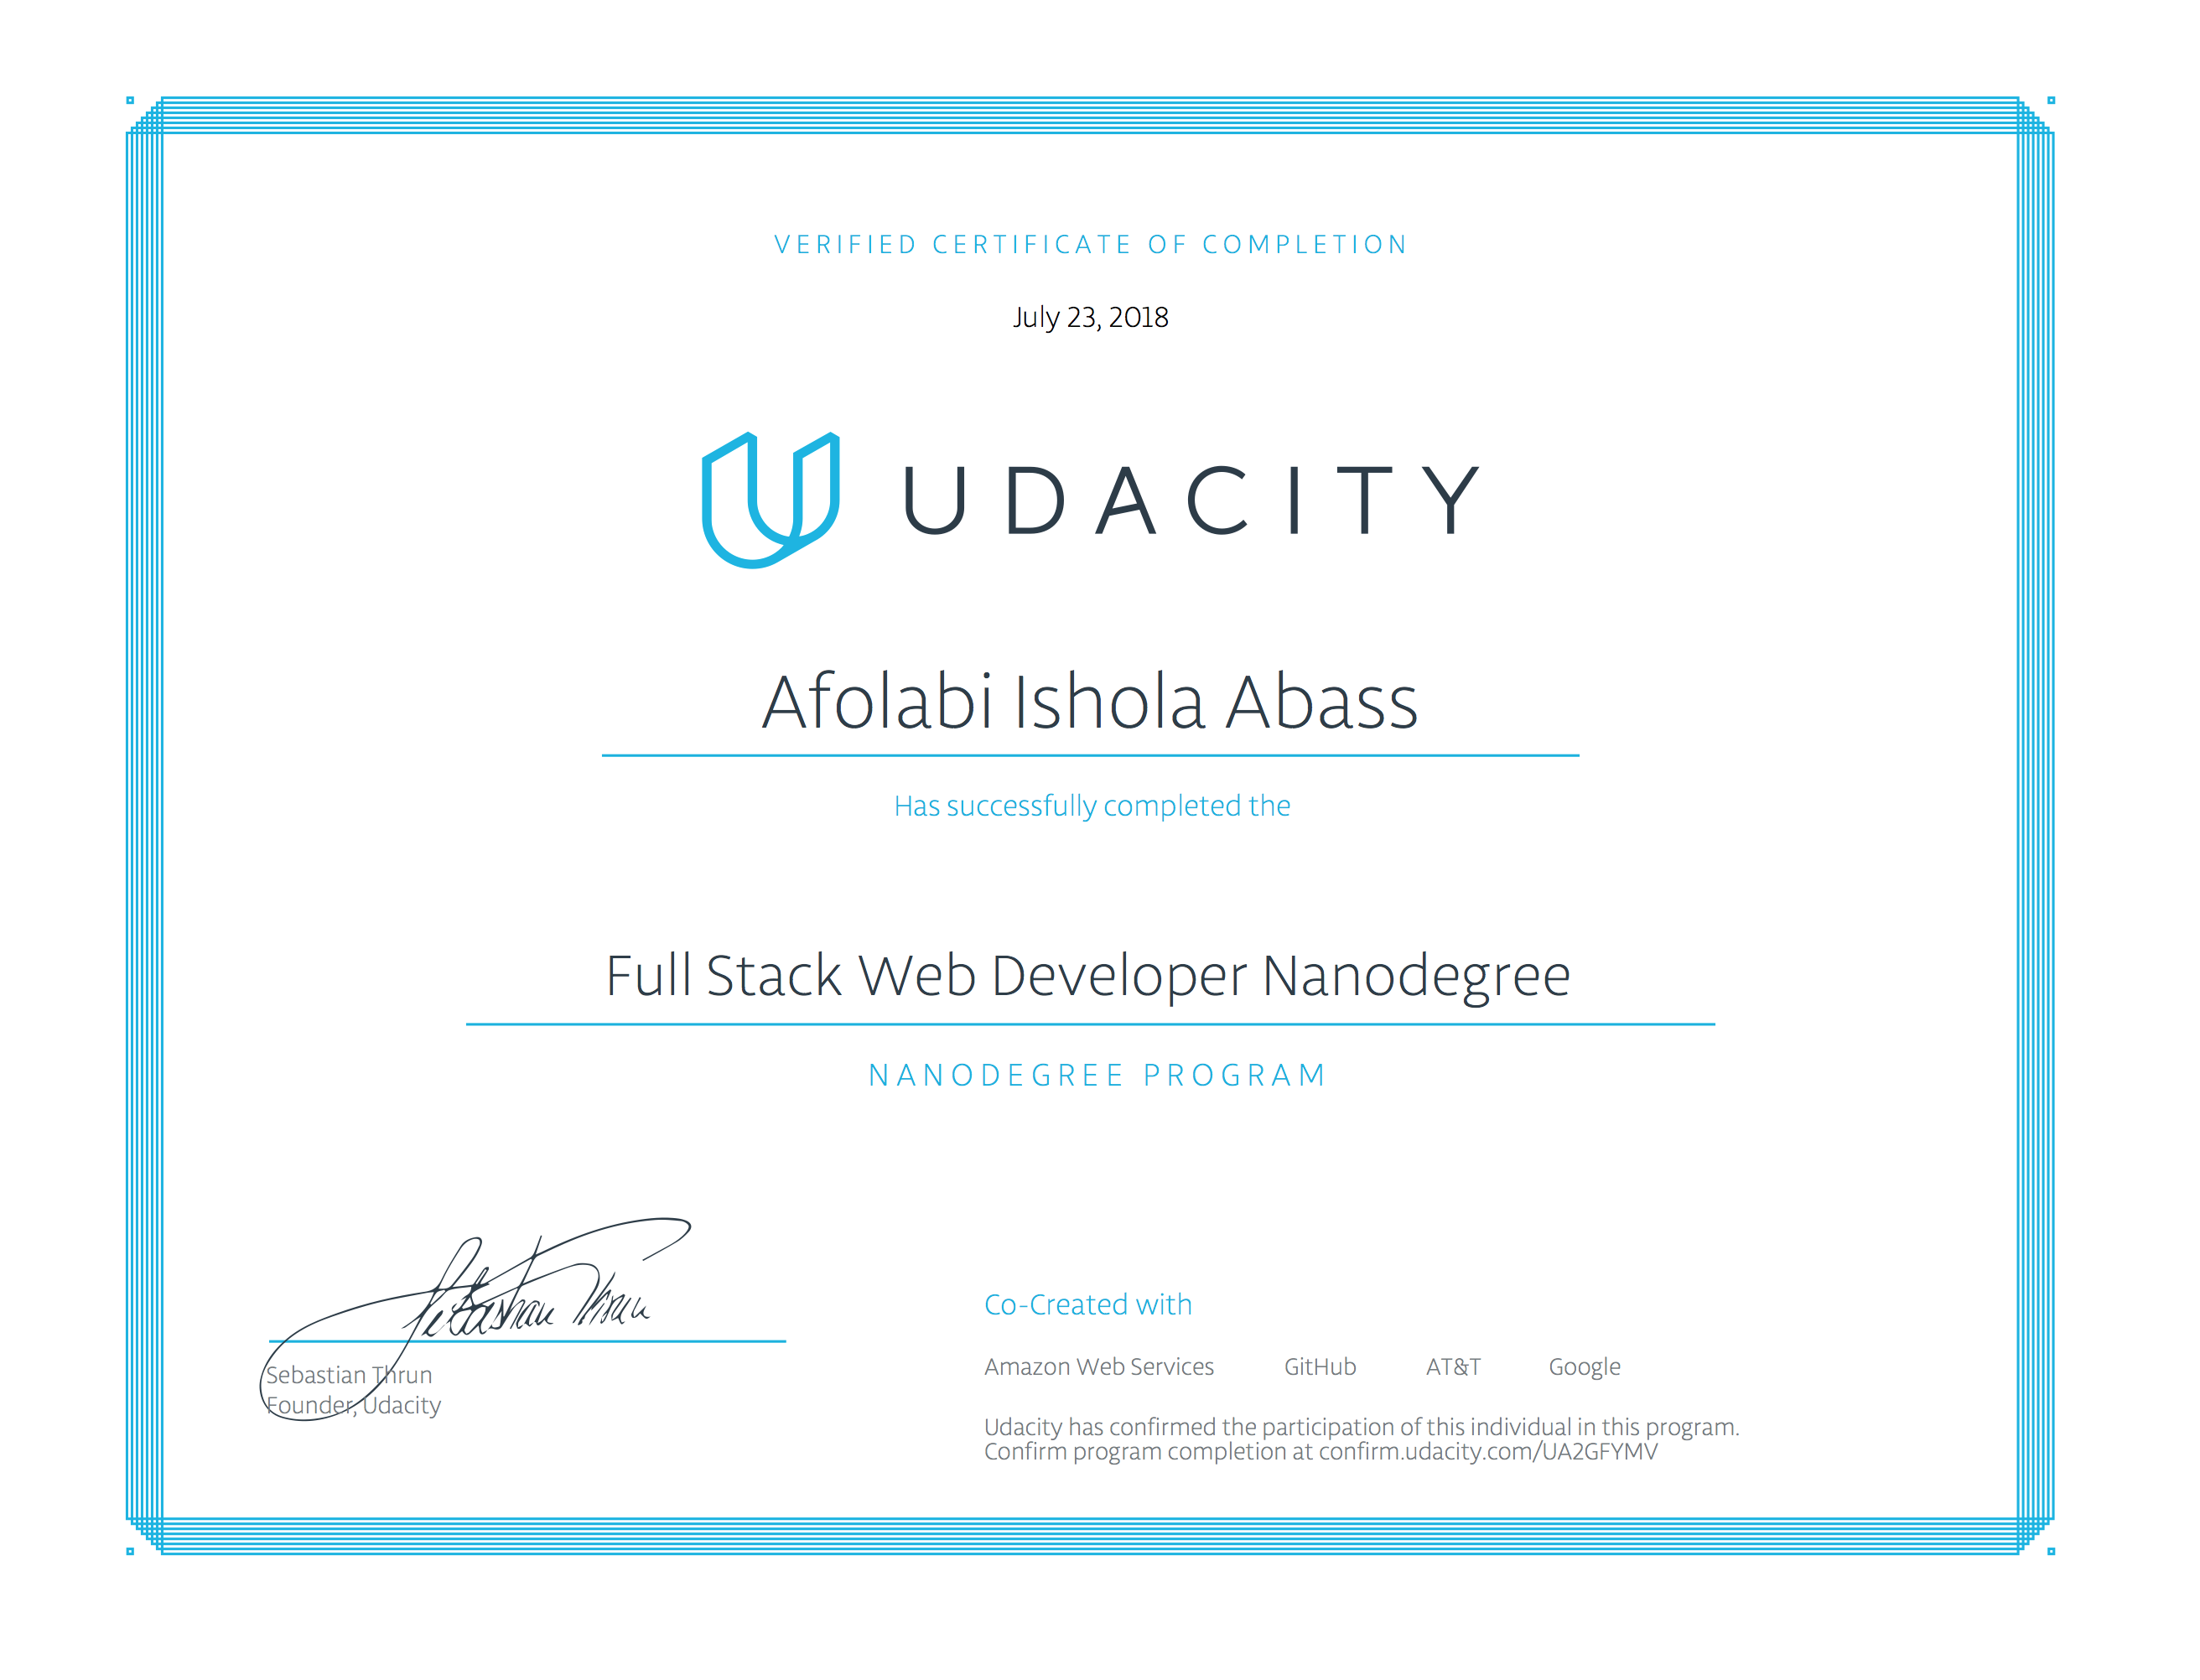 Udacity Certificate